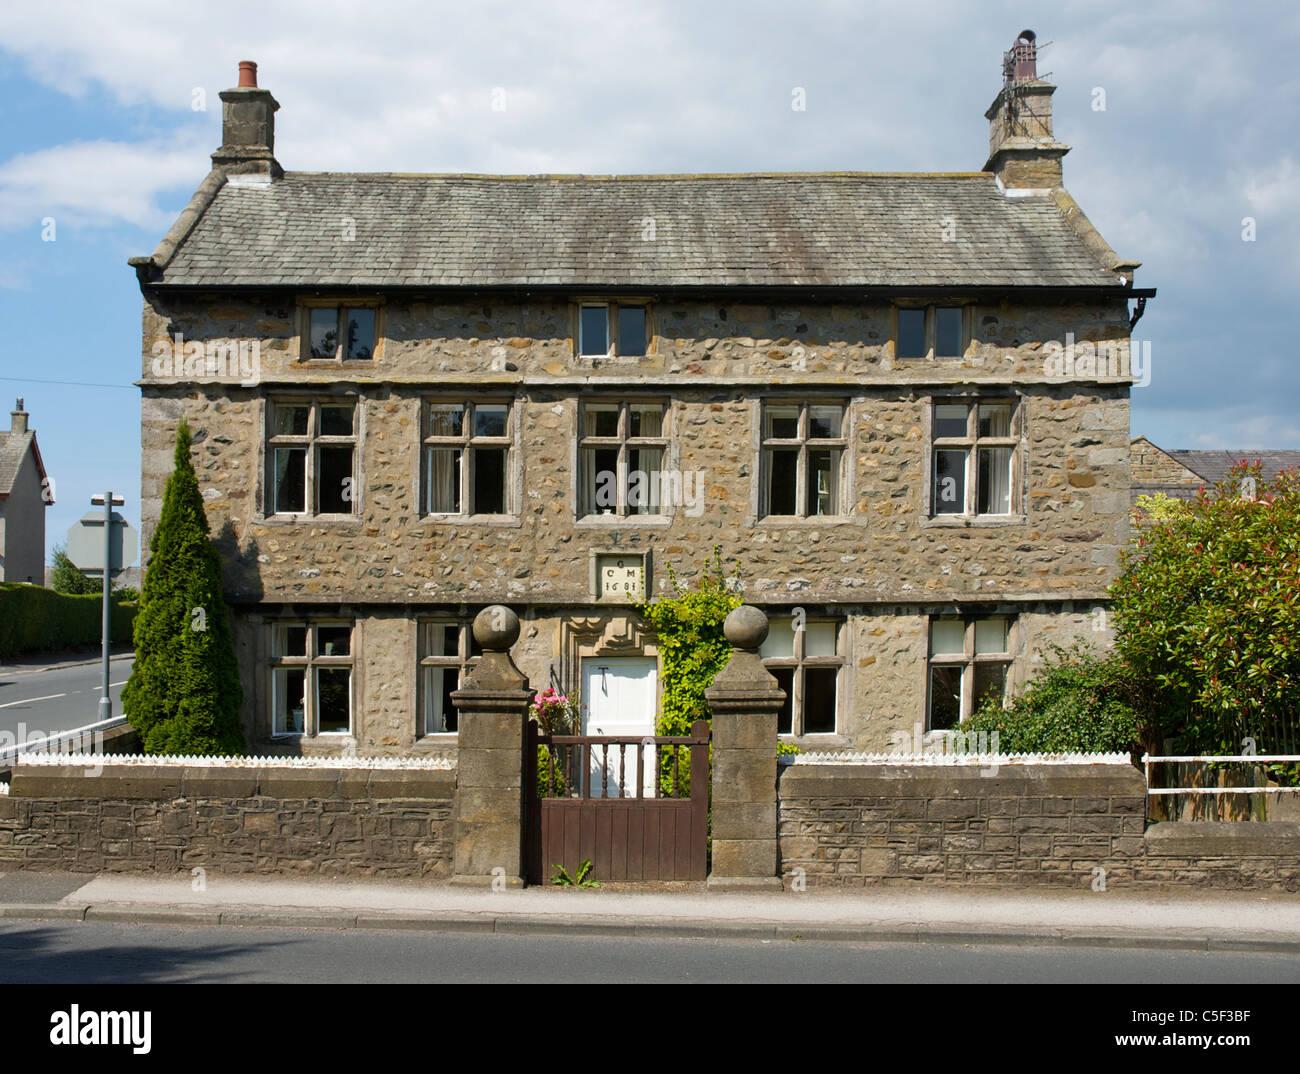 Slyne Hall (grade II listed building) in village of Slyne, near Morecambe, Lancashire, England UK - Stock Image